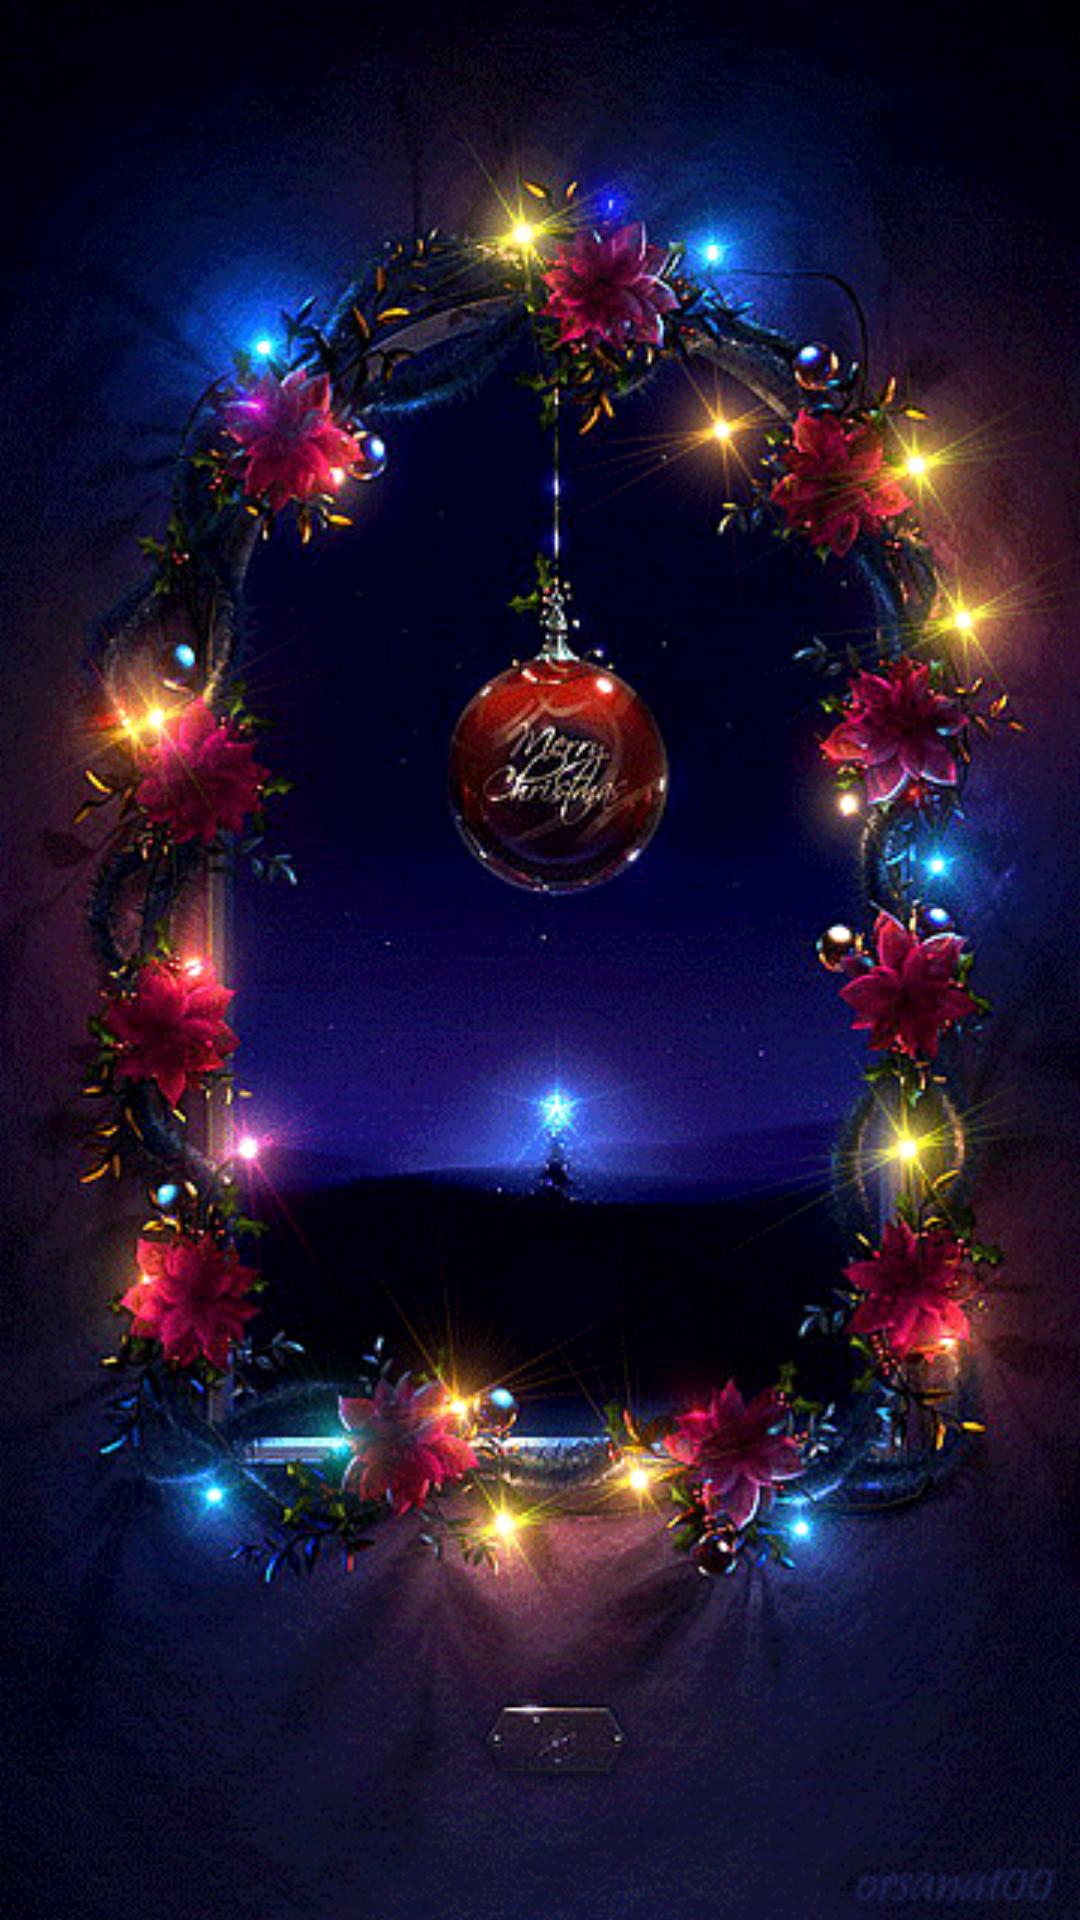 Christmas Gif Christmas Gif Animated Christmas Christmas Wallpaper